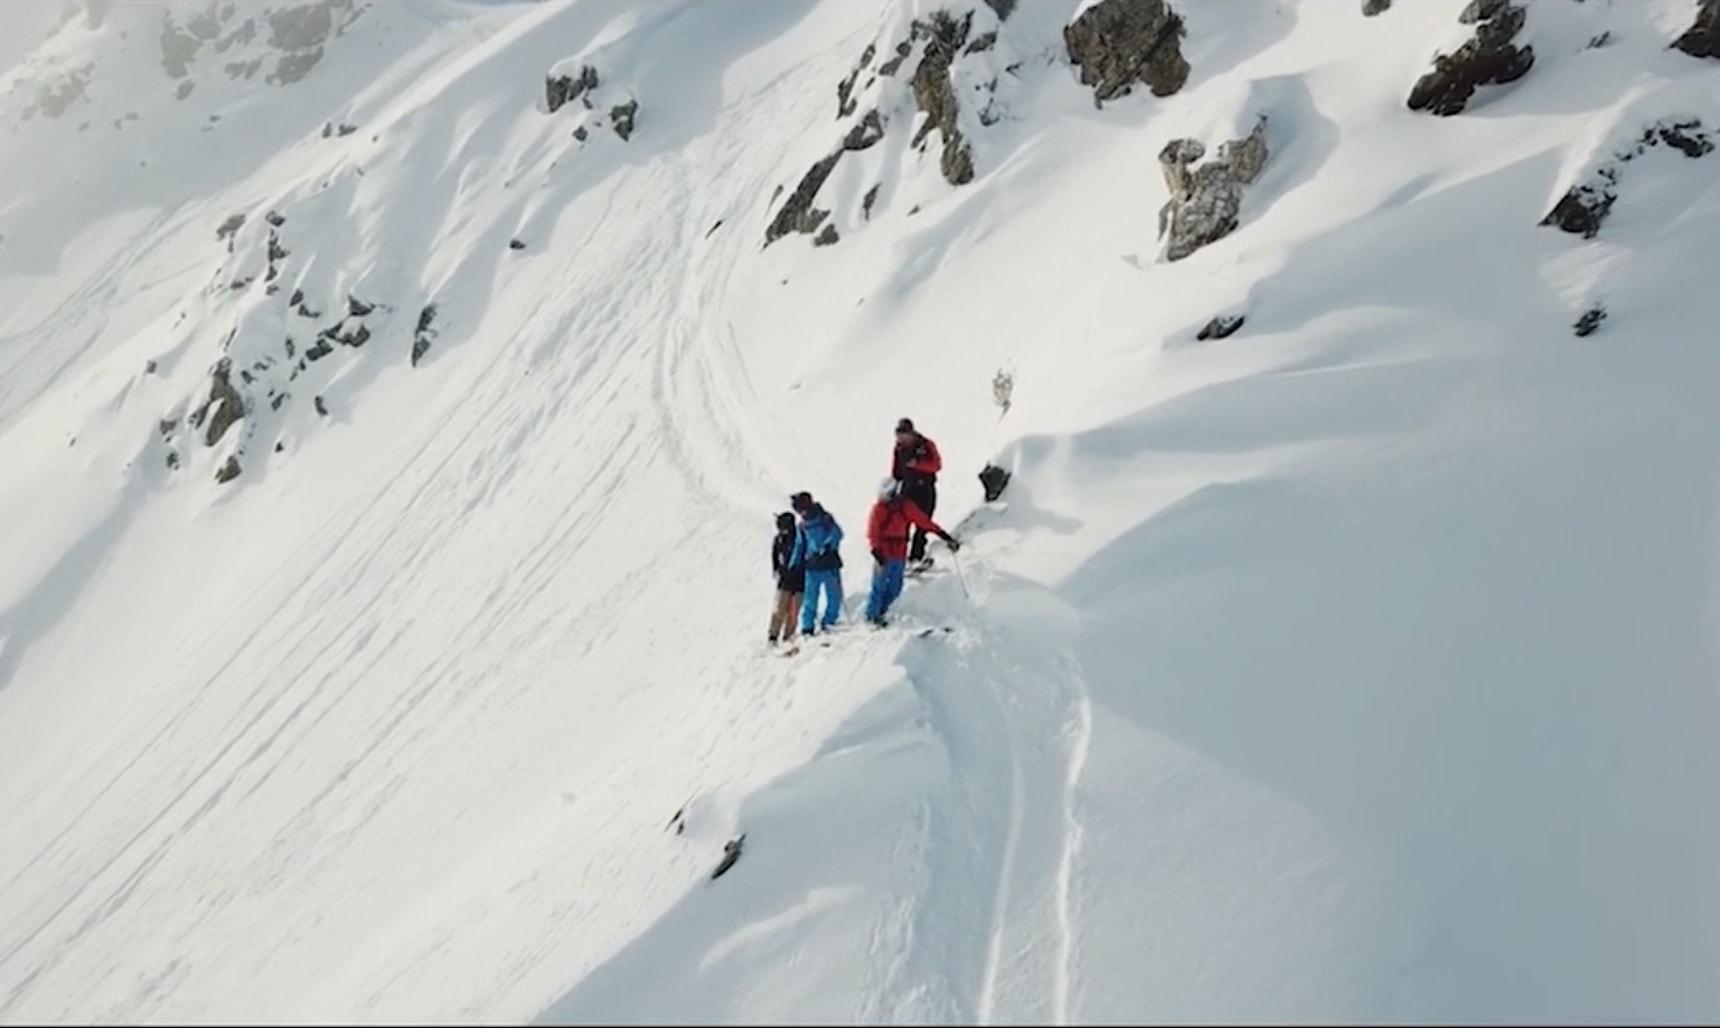 Peter Nilsson, Olle Regnér, Emelie Eriksson on a mountain peak in Swiss Alps